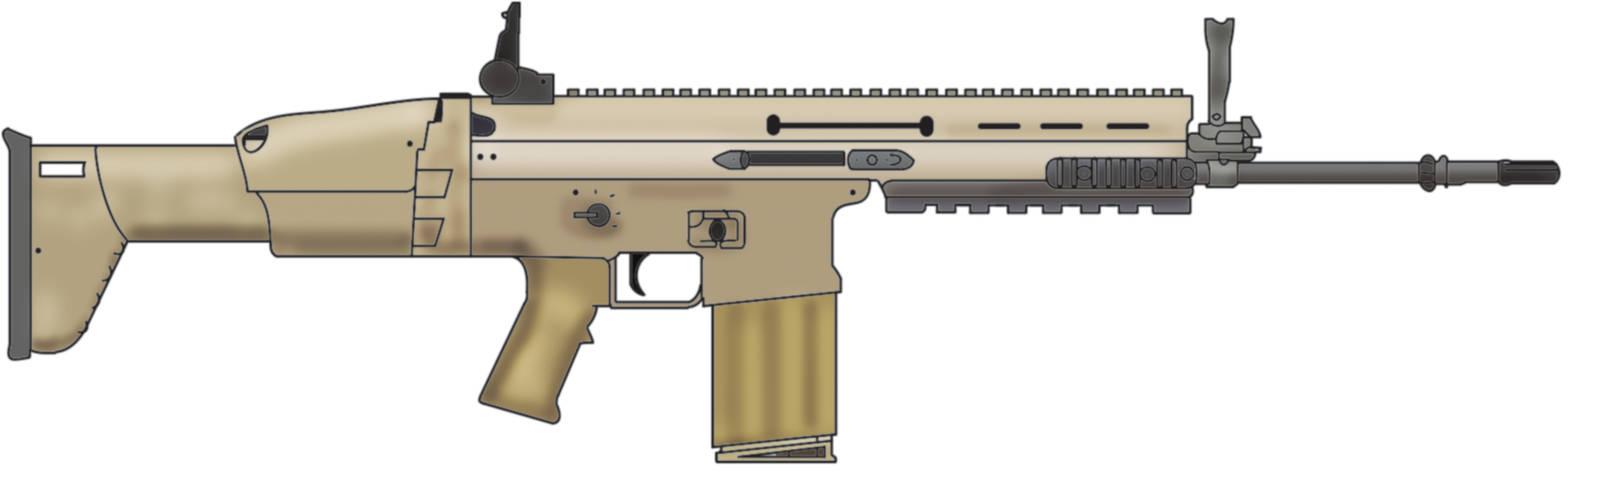 FN Scar-H by Ch42K on DeviantArt